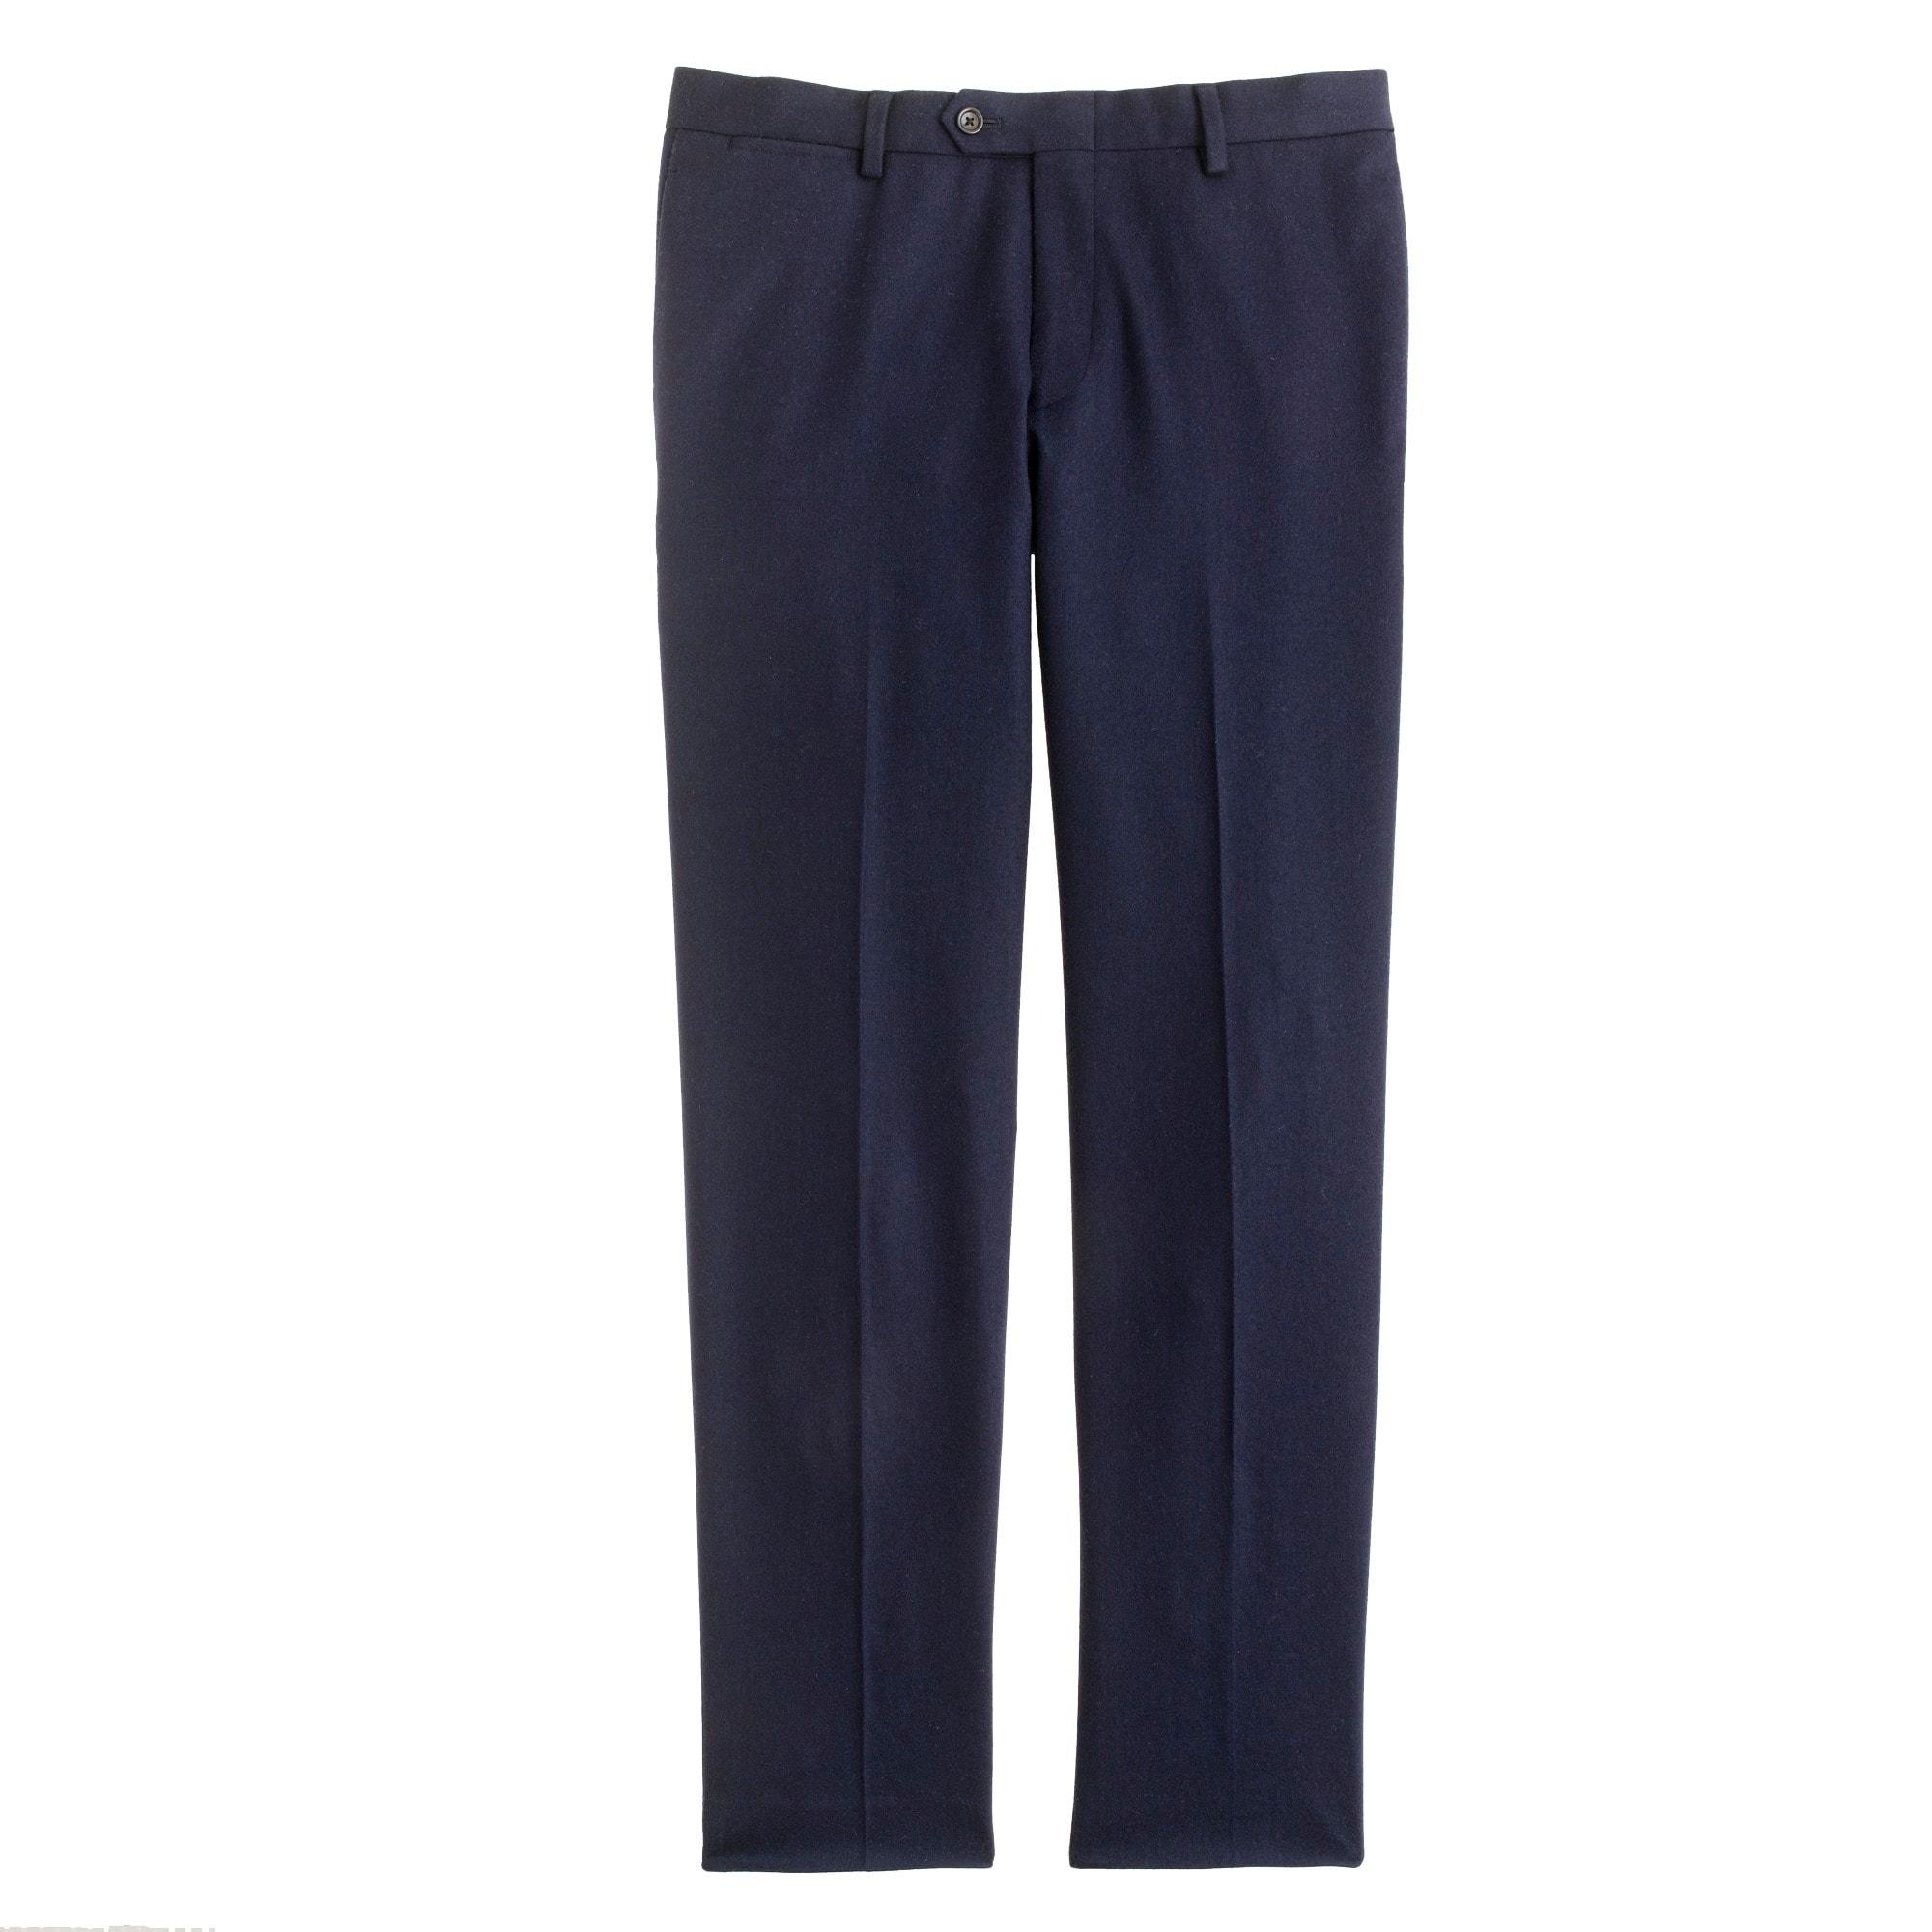 Ludlow Fielding slim suit pant in English wool